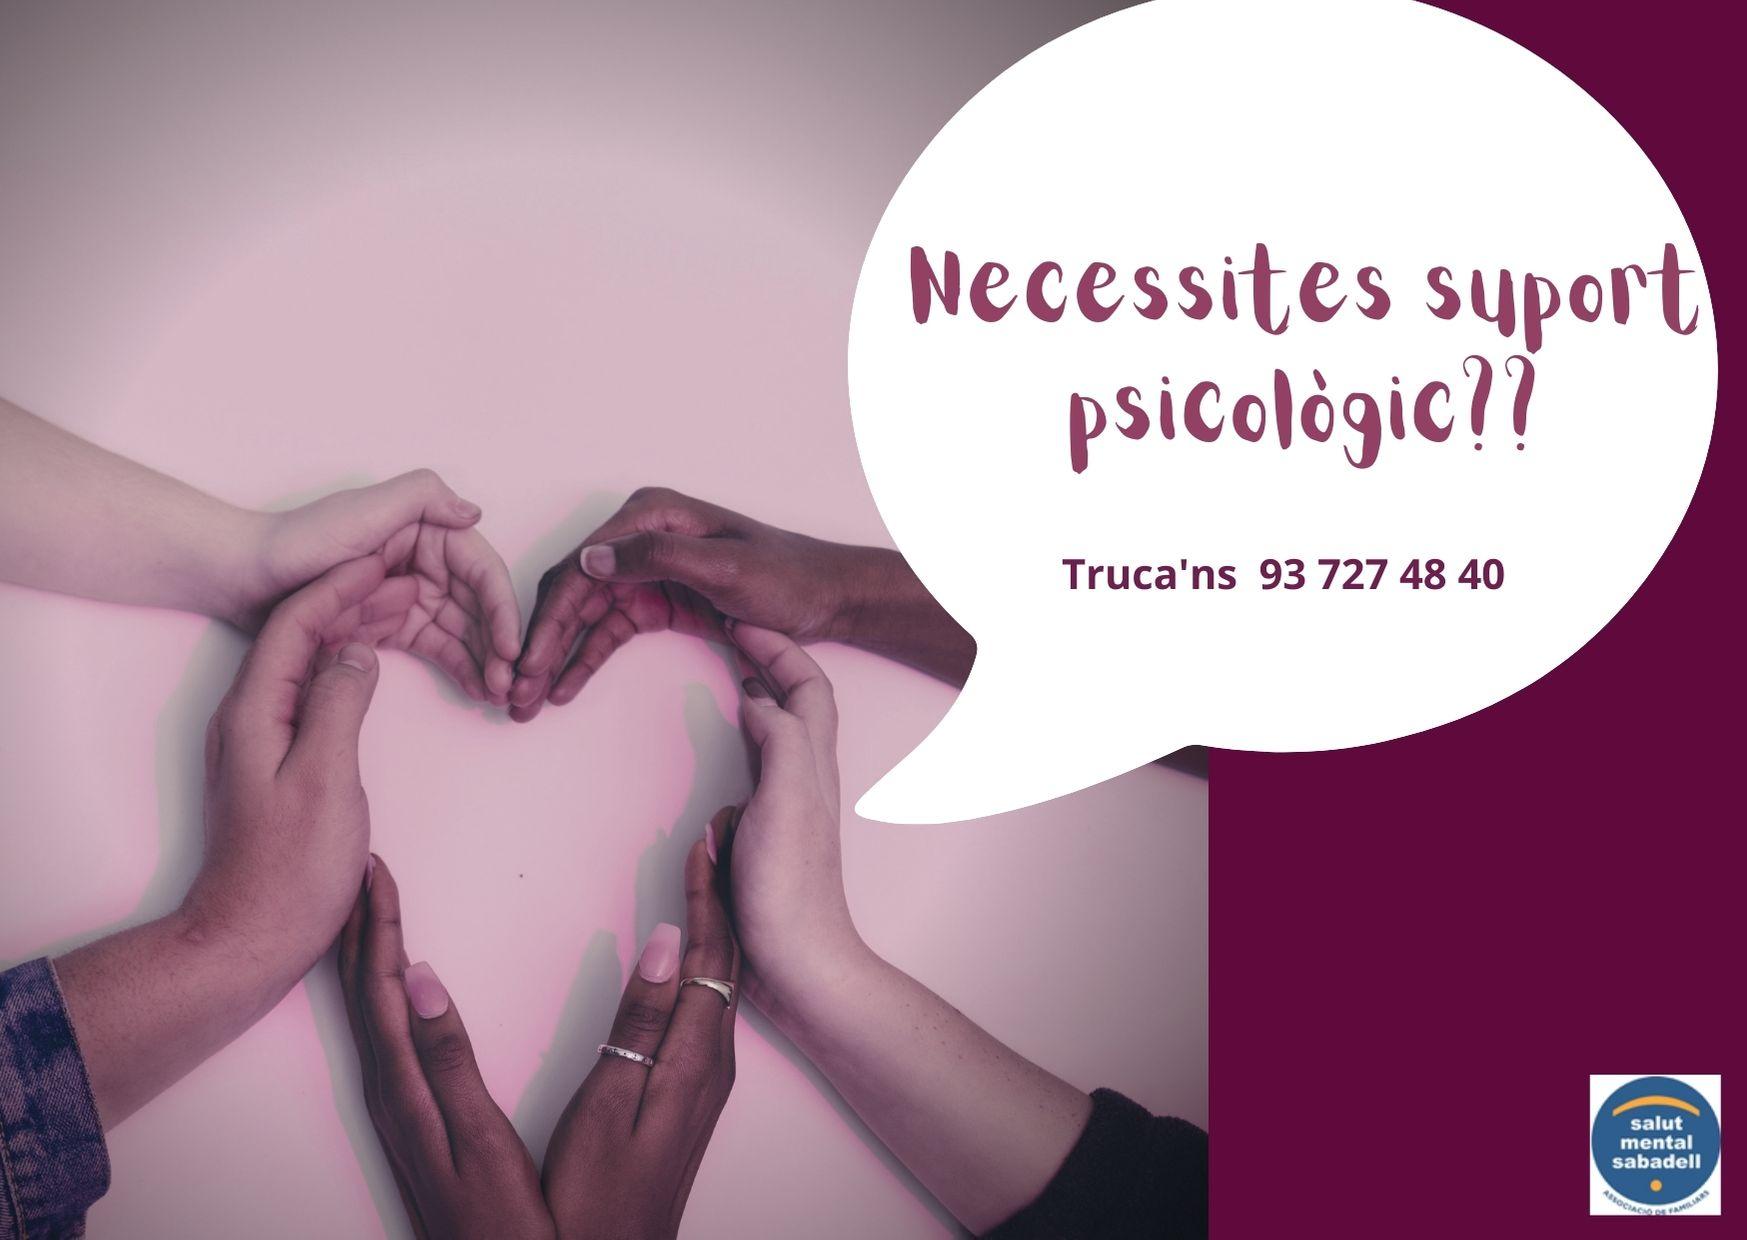 Et podem ajudar